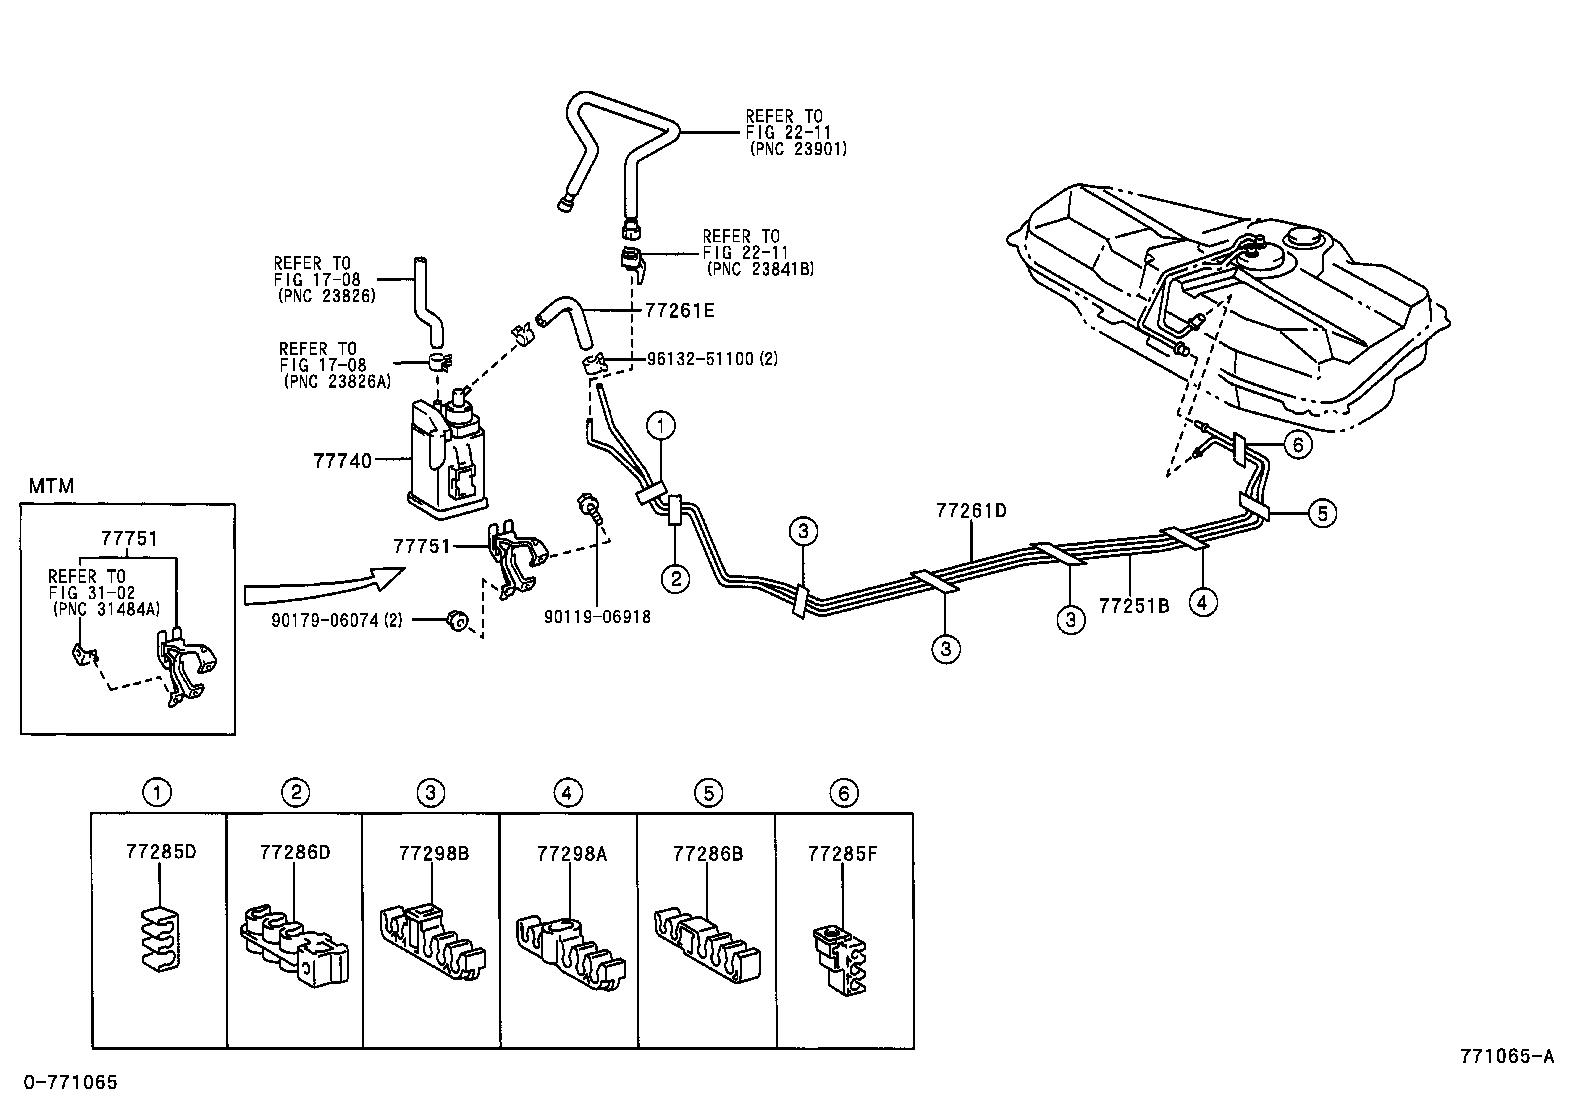 Mitsubishi Car Radio Wiring Diagram On Mangna Mitsubishi Wiring